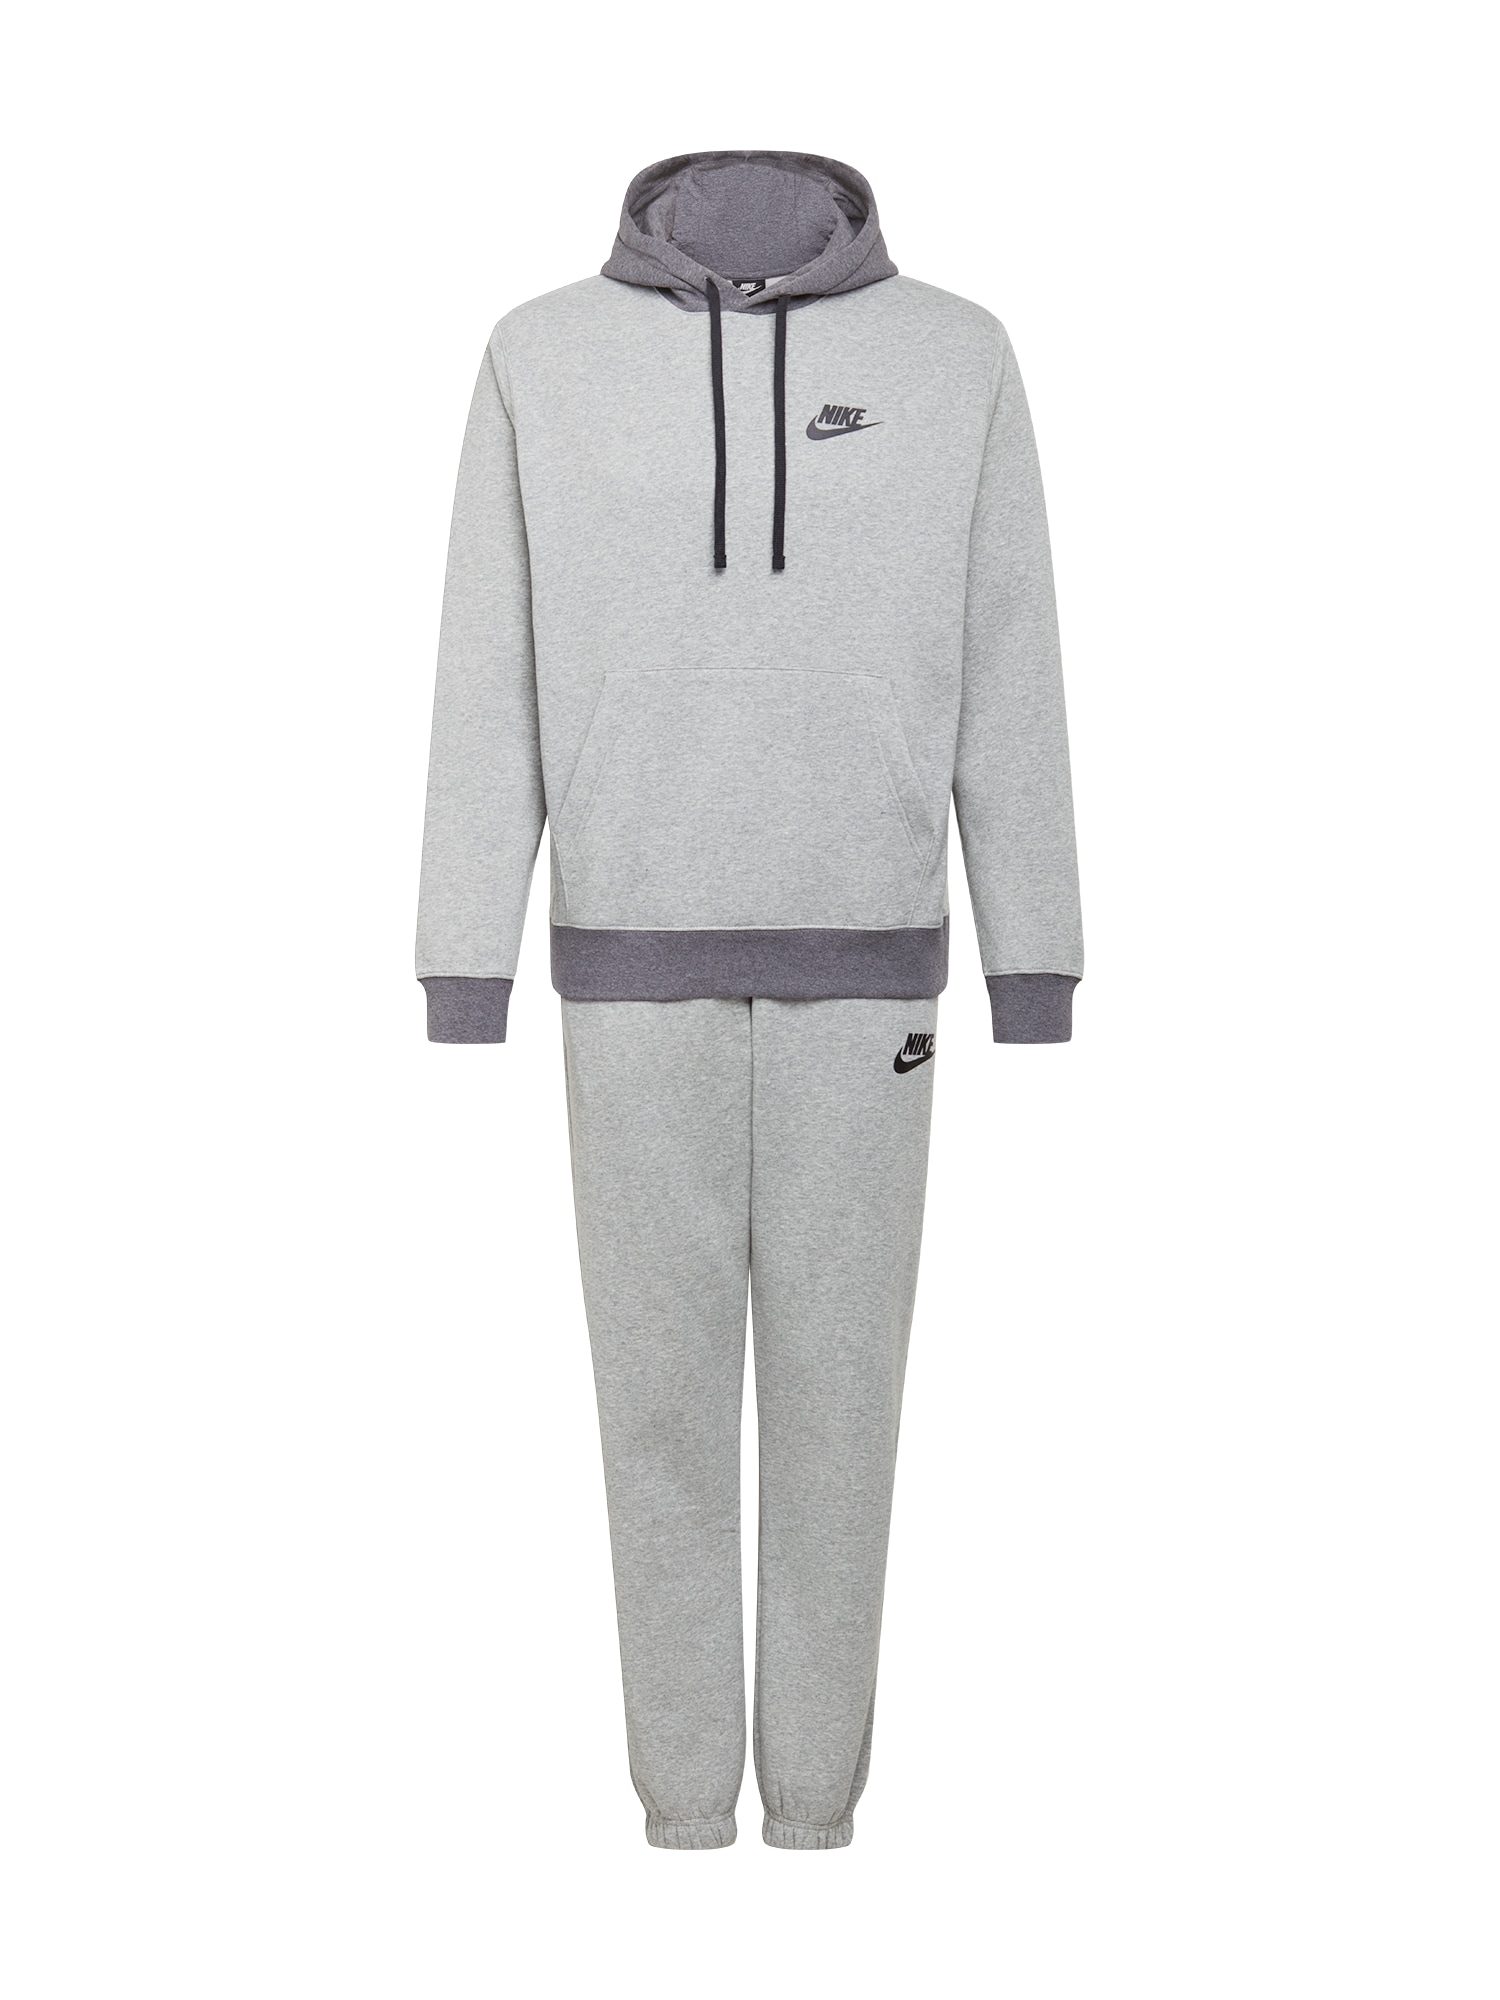 Nike Sportswear Treningas tamsiai pilka / pilka